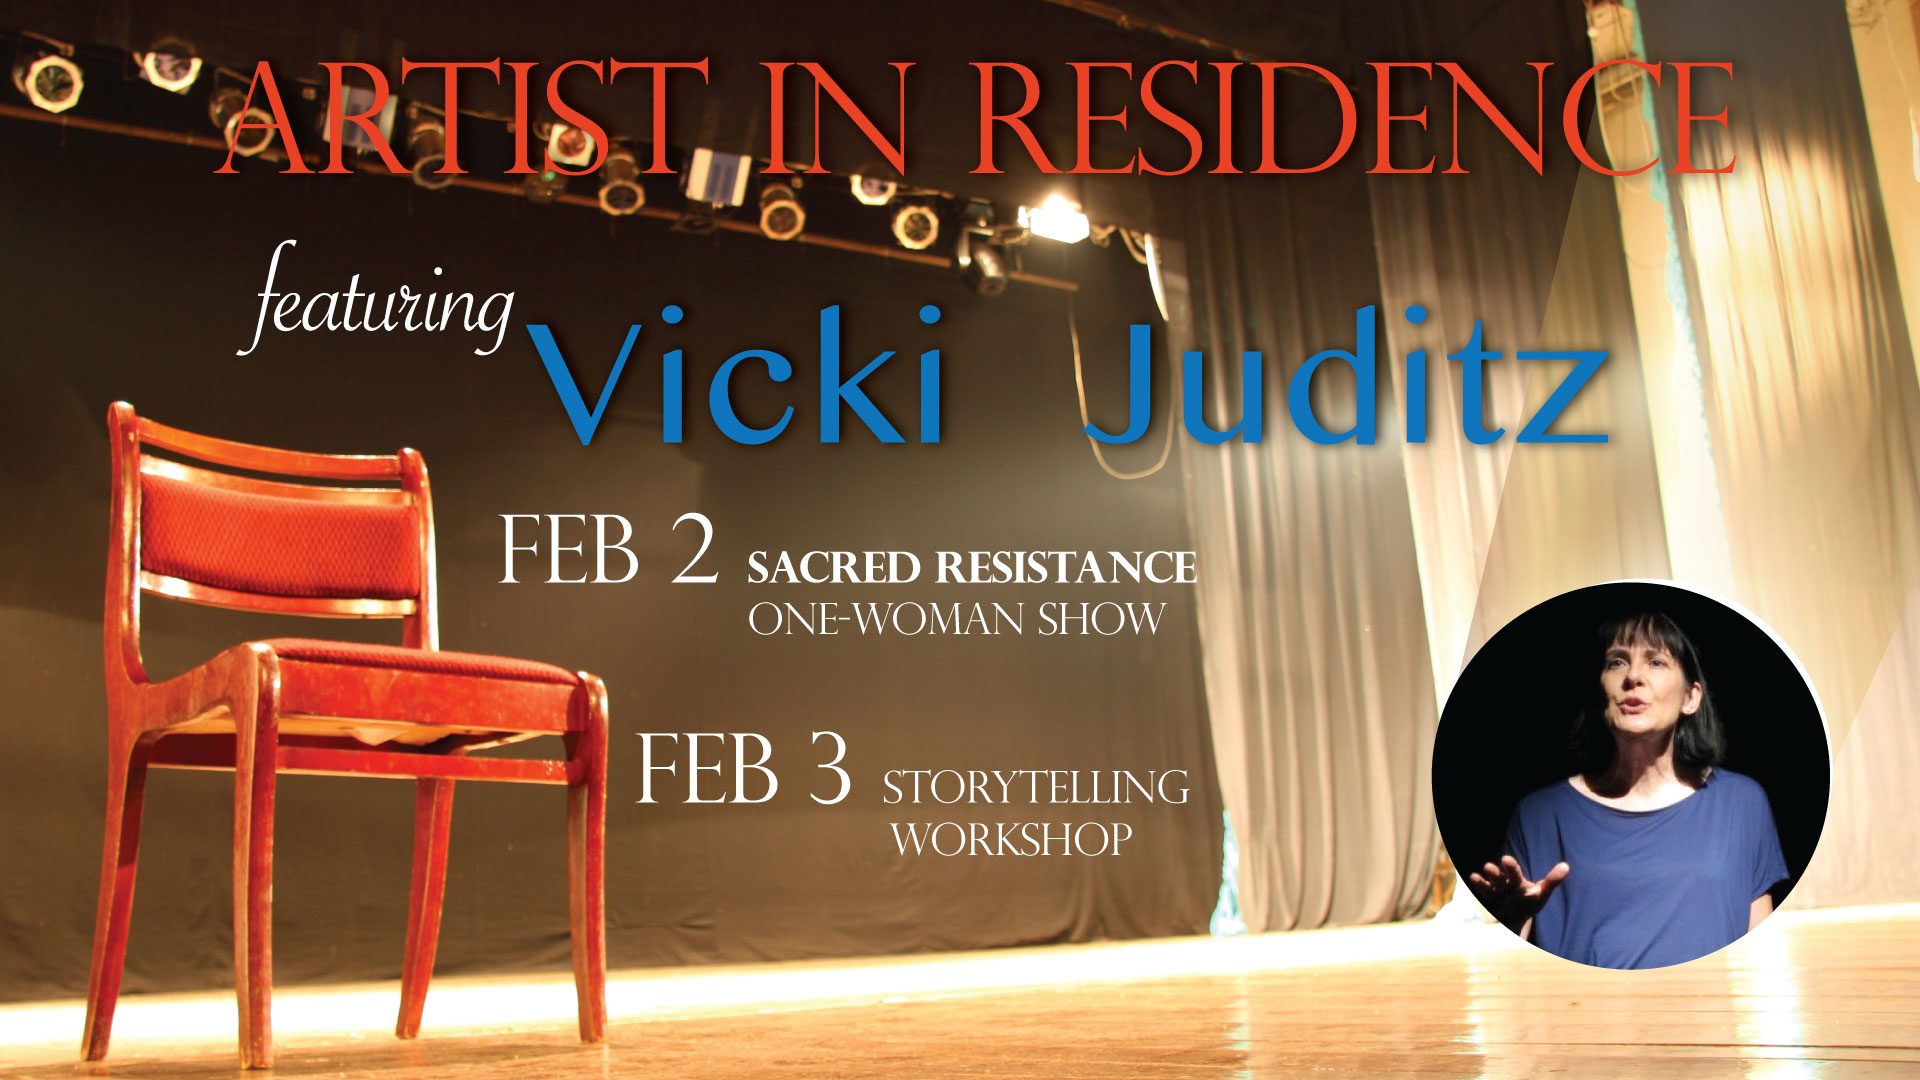 Artist in Residence: Vicki Juditz